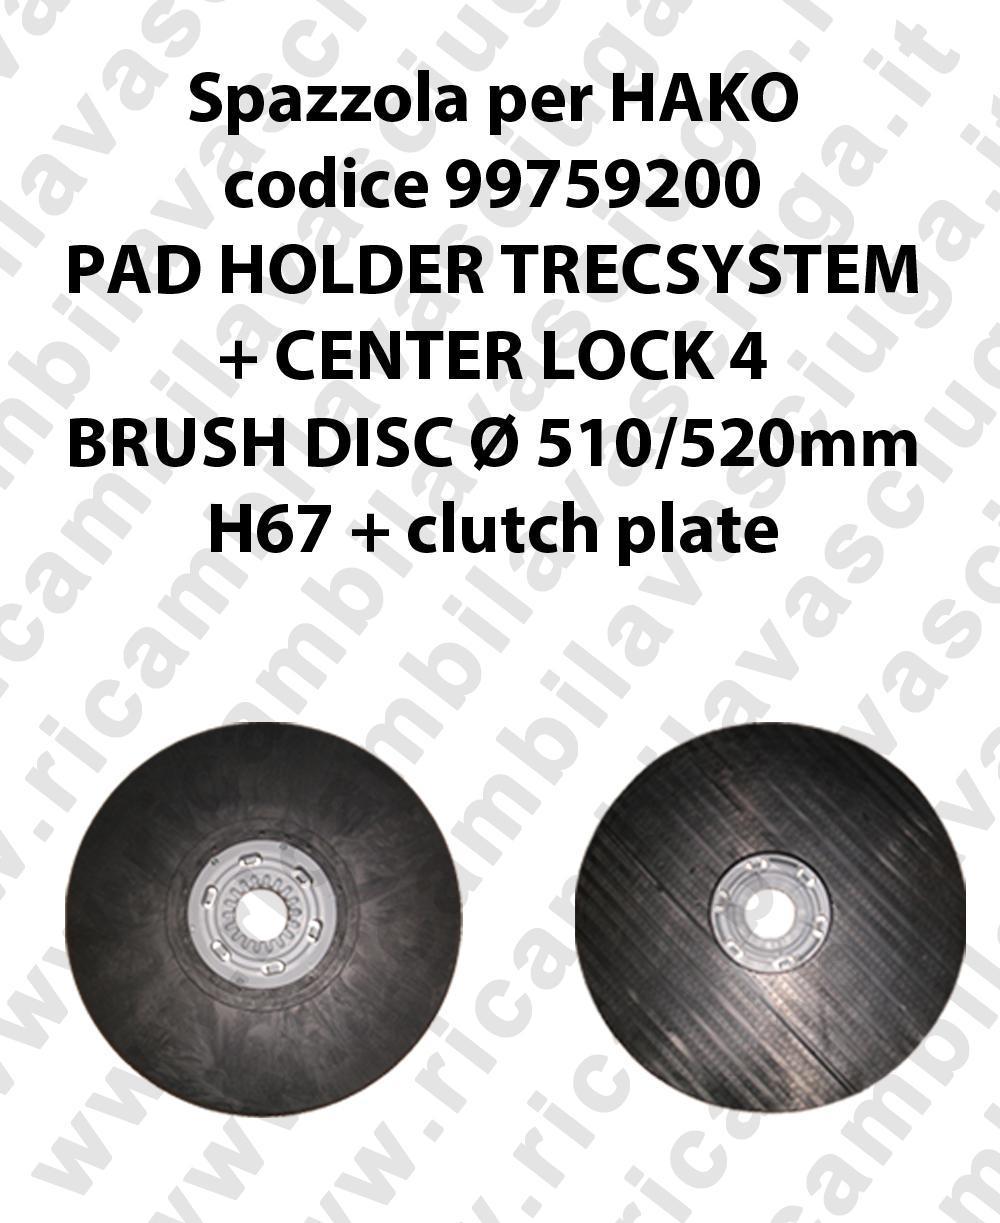 PAD HOLDER TRECSYSTEM  for scrubber dryer HAKO Code 99759200